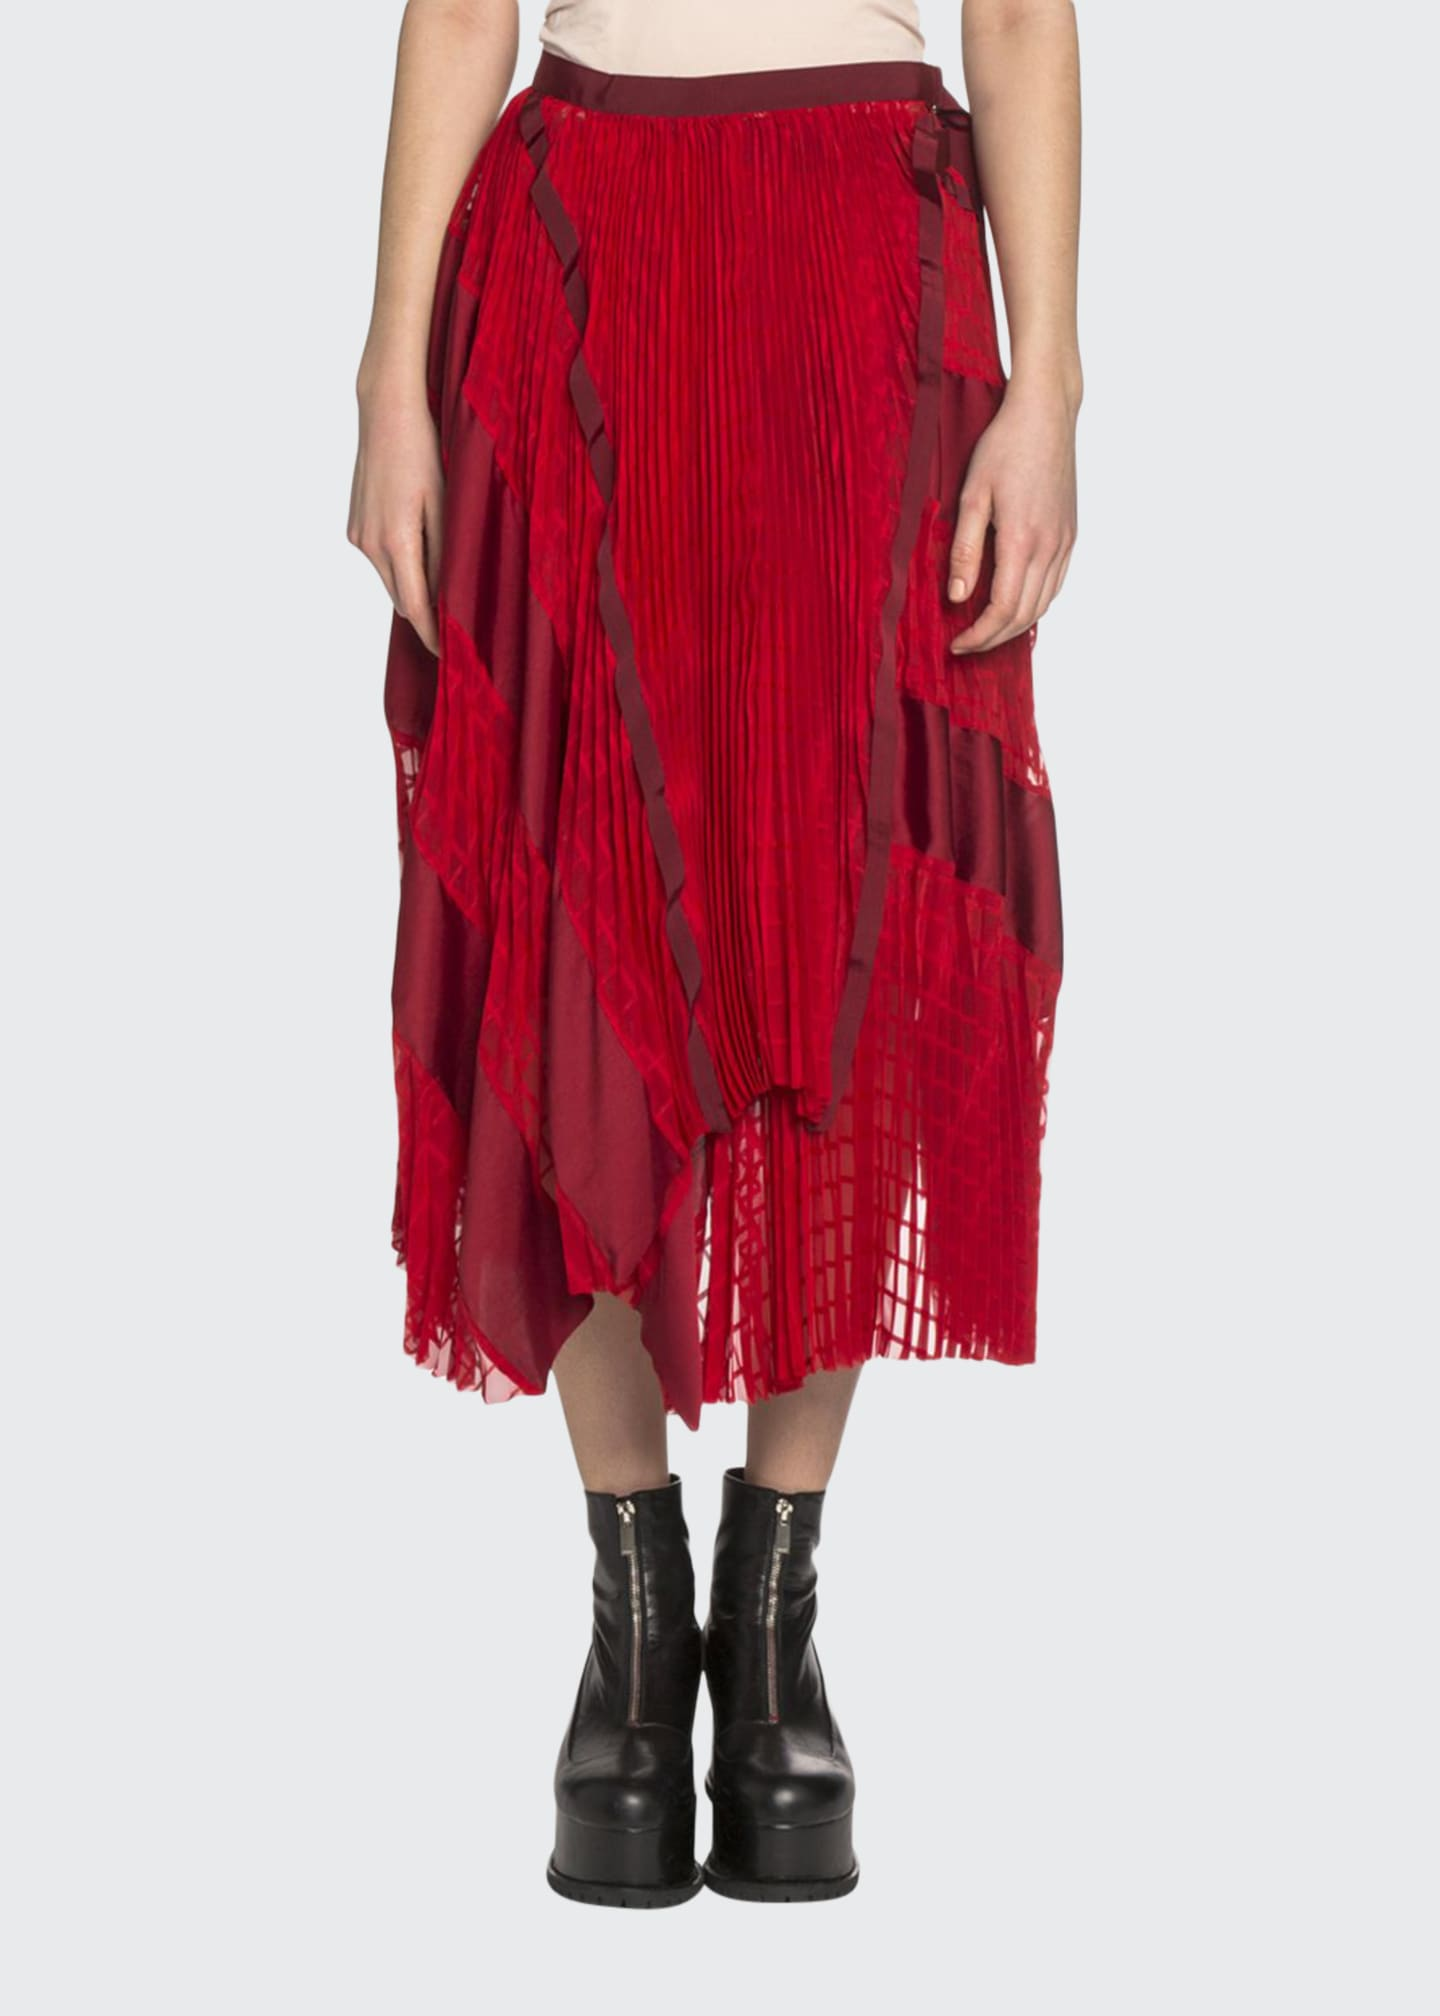 SACAI Lace & Satin Panel Asymmetric Midi Skirt